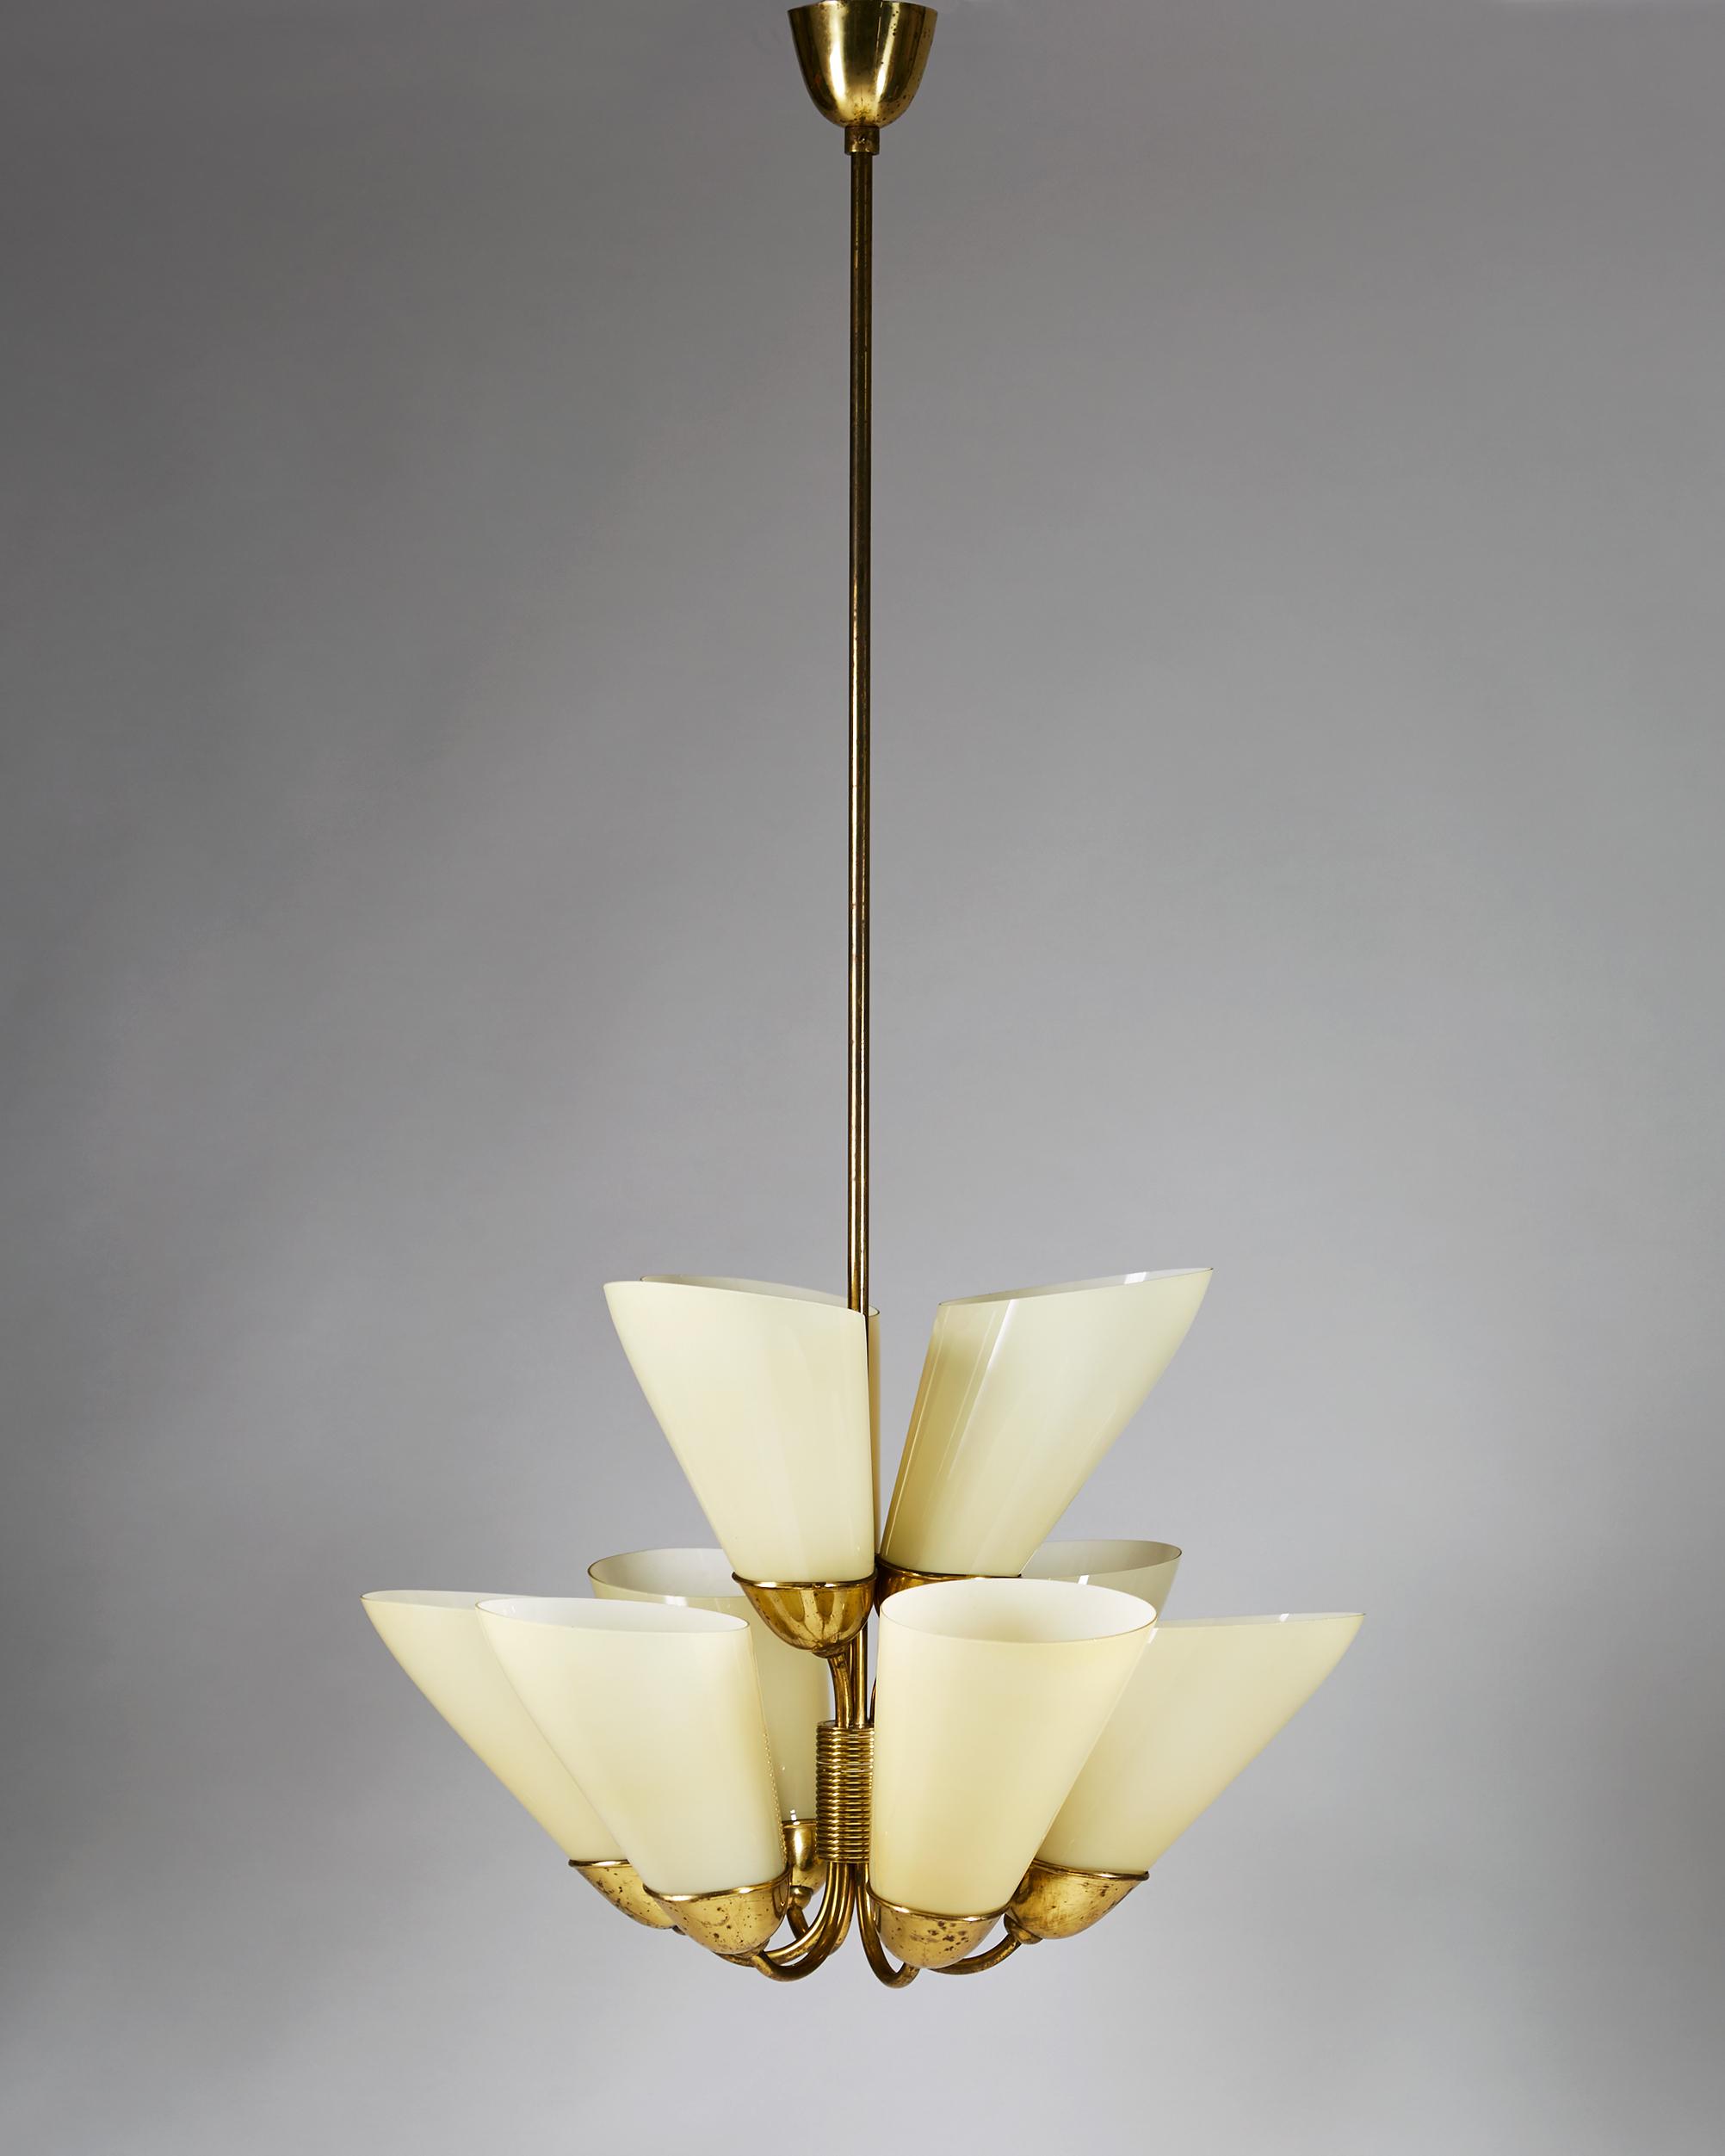 Mauri Almari  Pair of chandeliers, model K1-40 Finland. 1950's Brass and glass. 150 x 70 cm